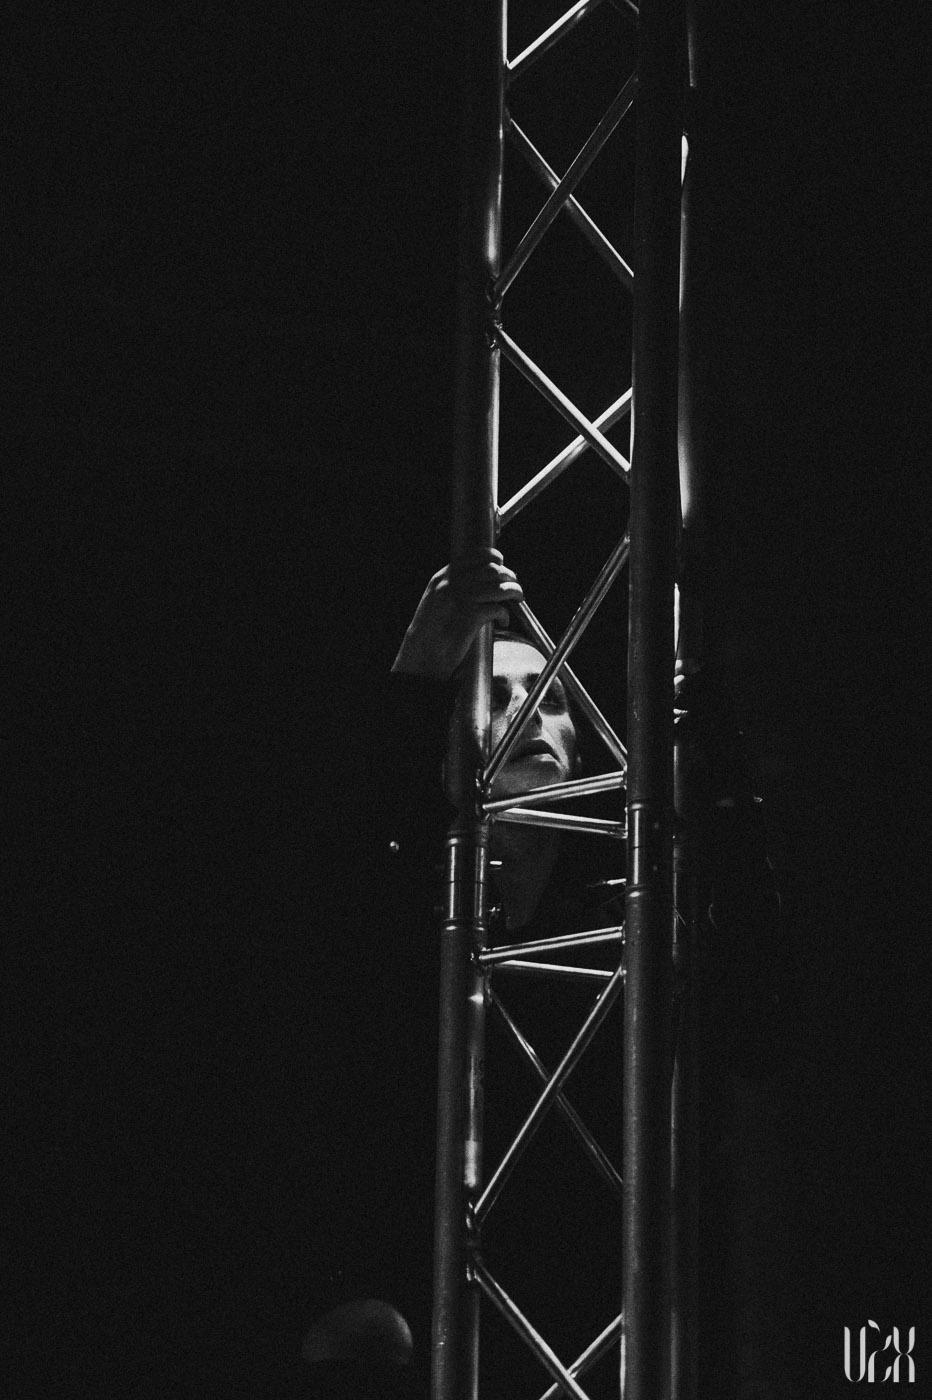 E.sabaliauskaite Vzx.lt Faustas Teatras Event 030